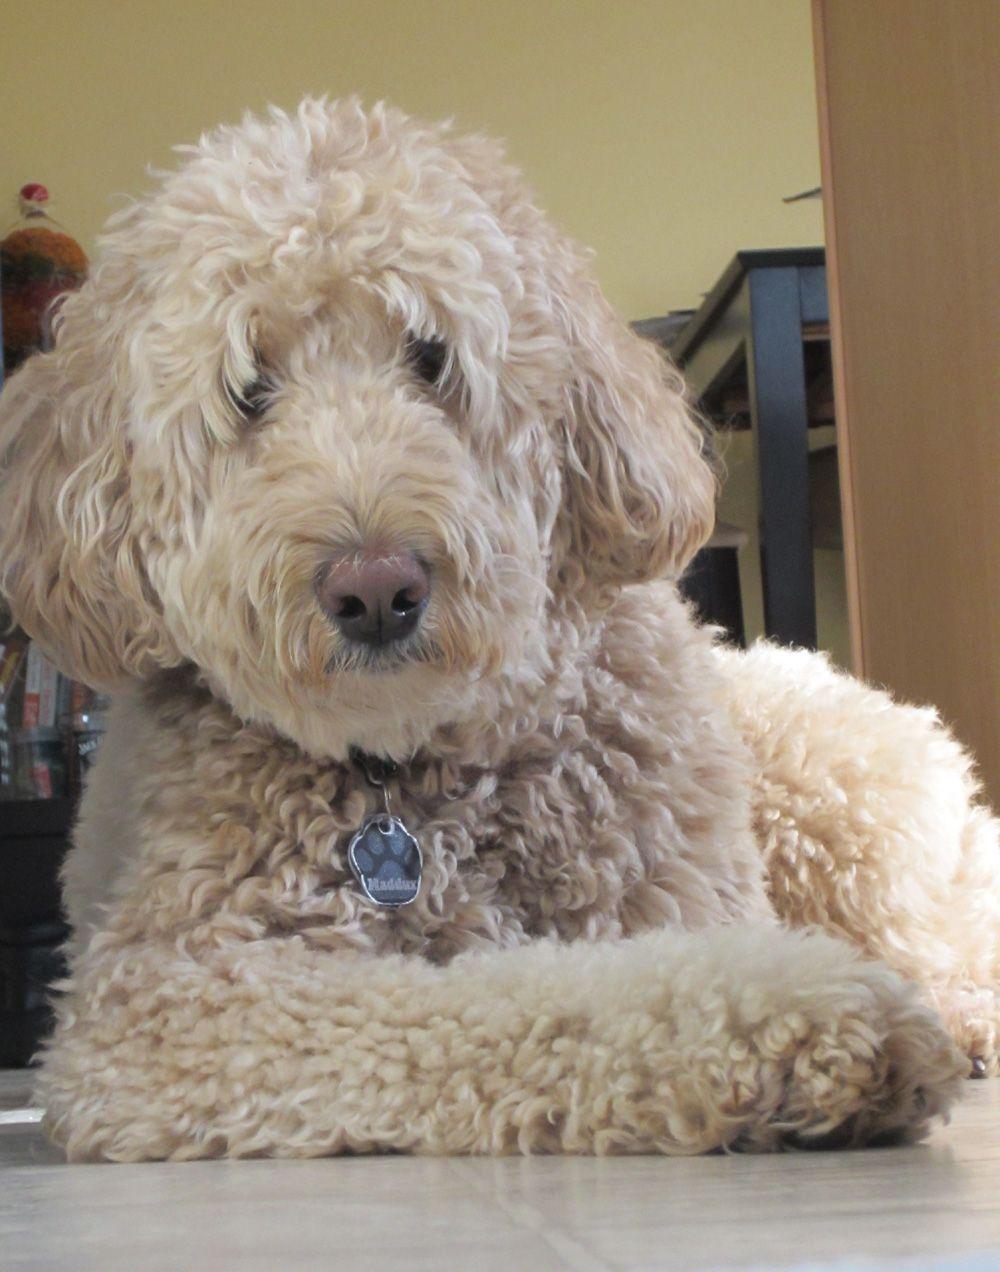 Maddux My Fluffy Labradoodle Mini Goldendoodle Puppies Goldendoodle Puppy For Sale Labradoodle